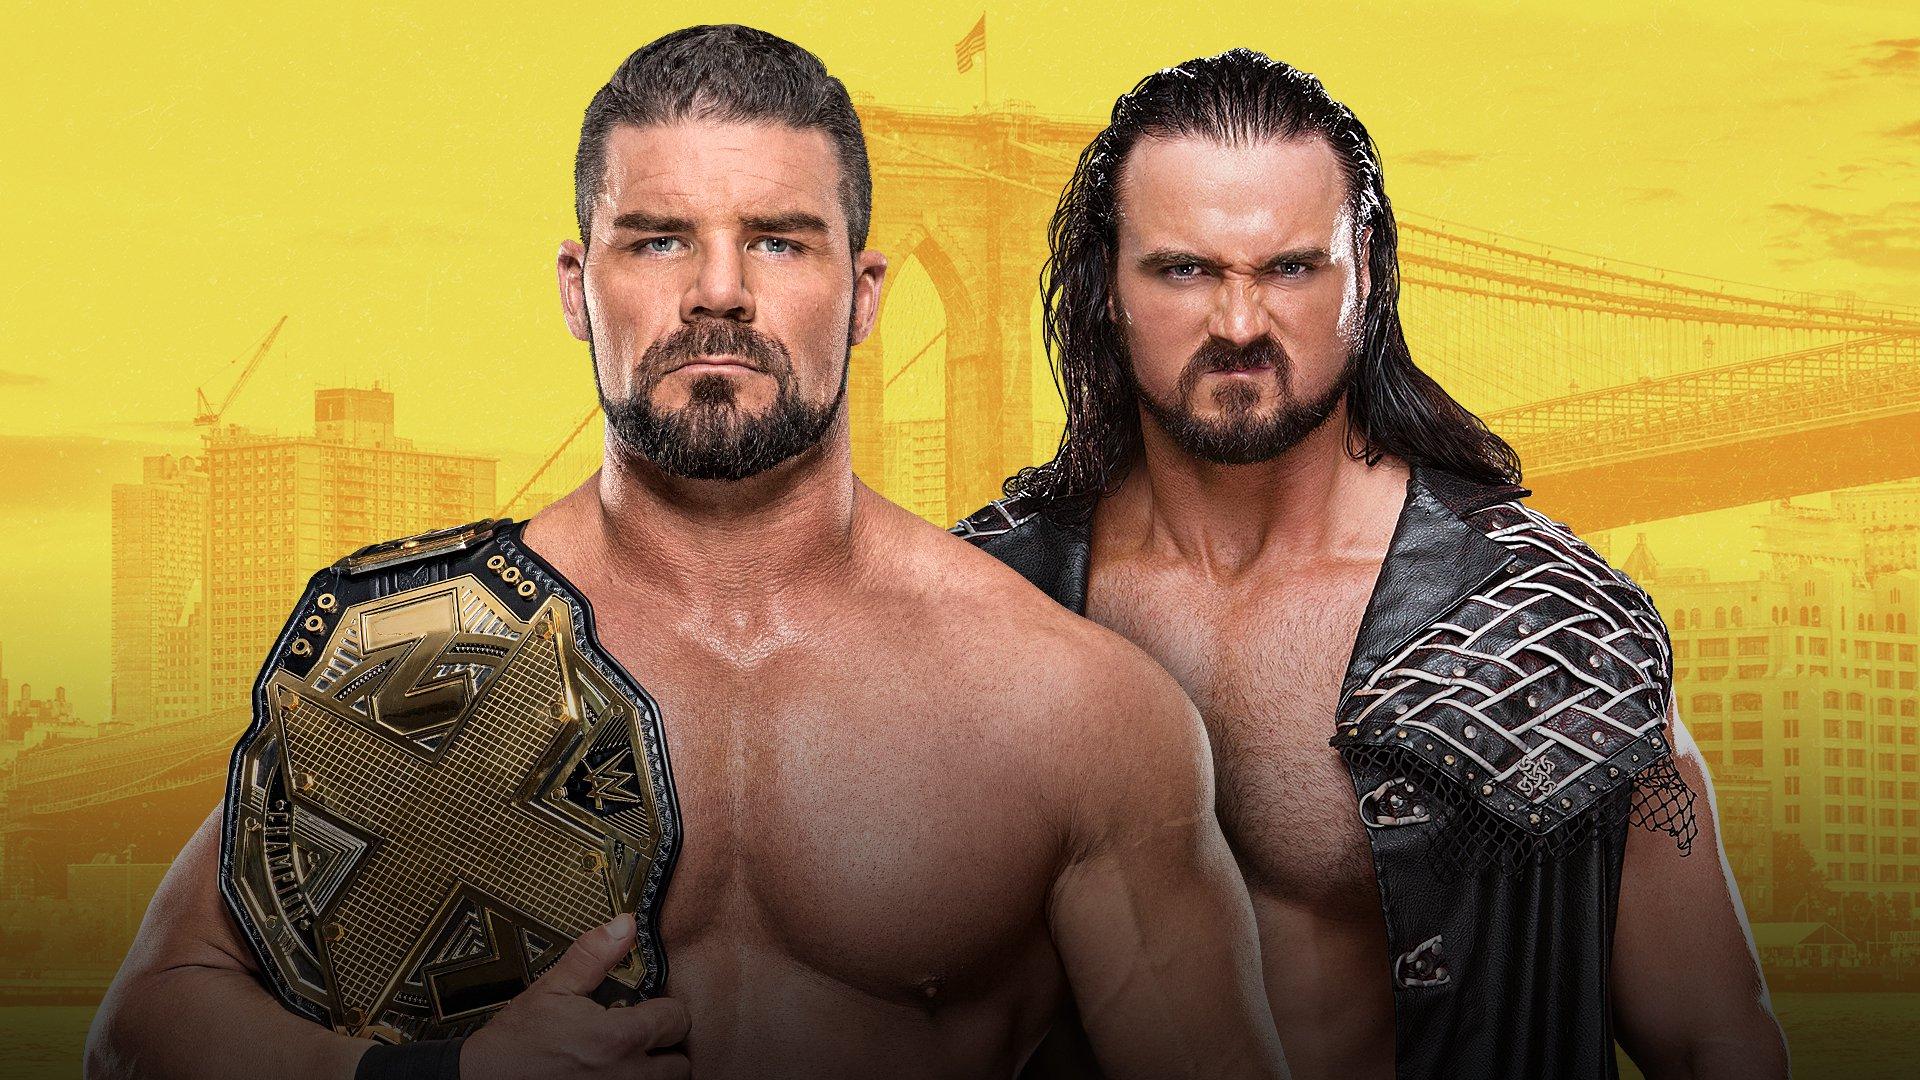 NXT TakeOver - Brooklyn III: Bobby Roode vs. Drew McIntyre